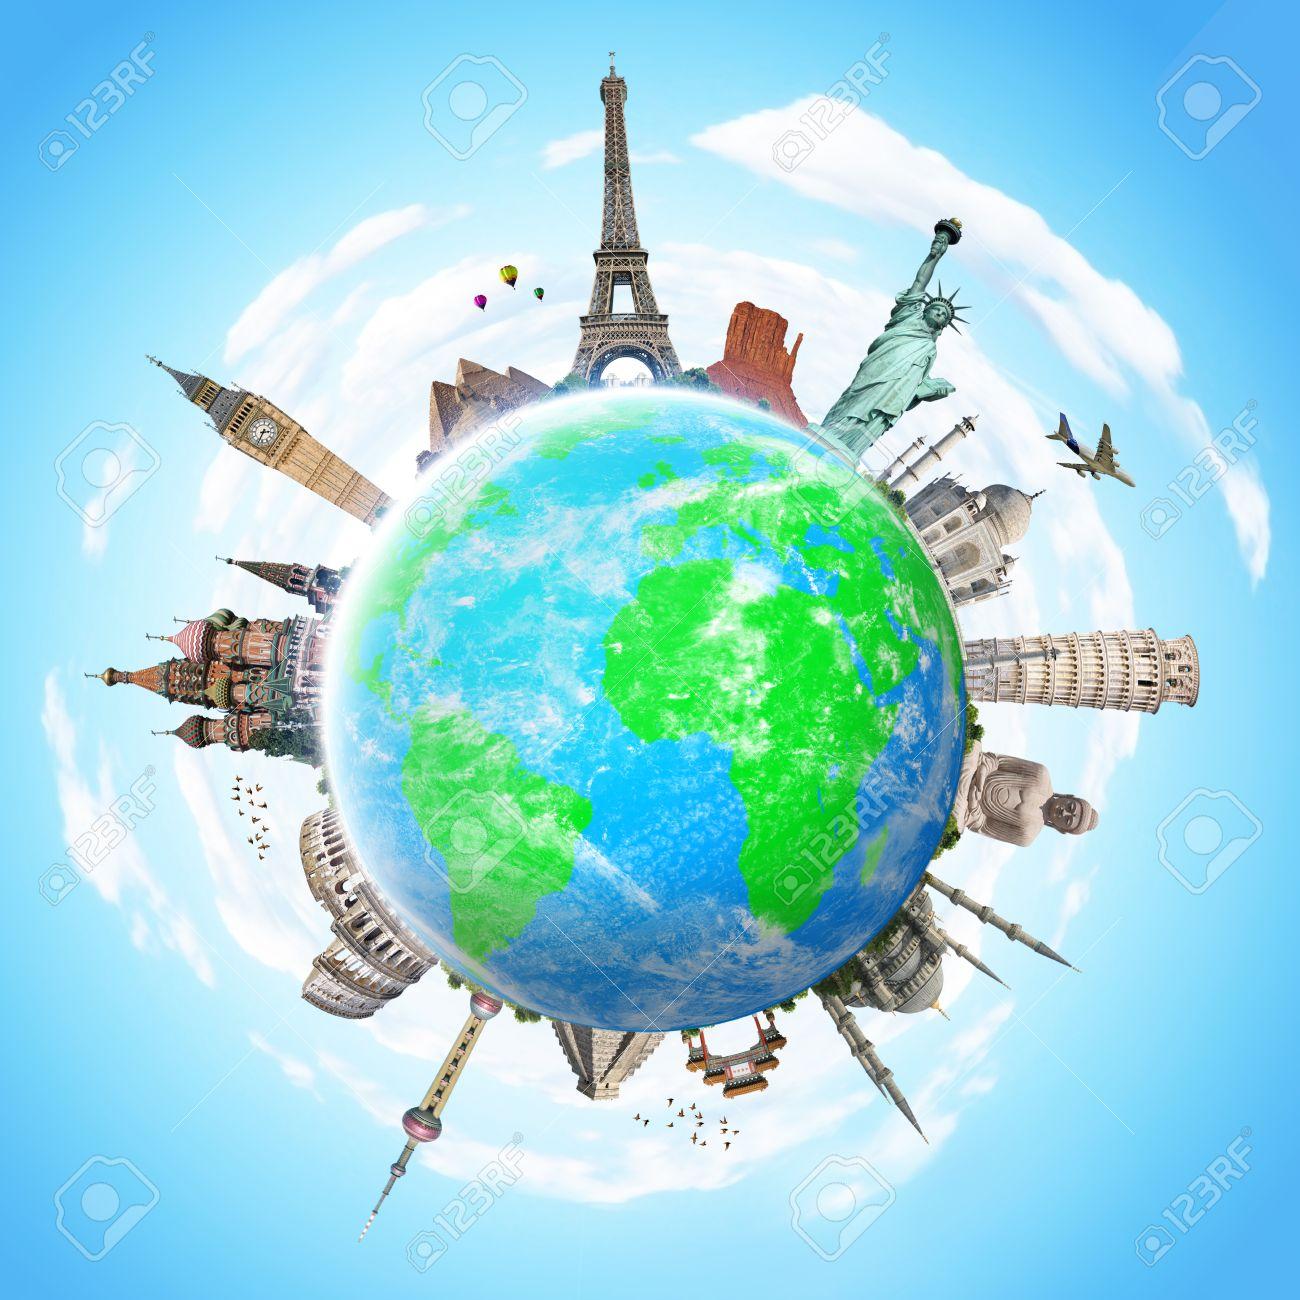 World images